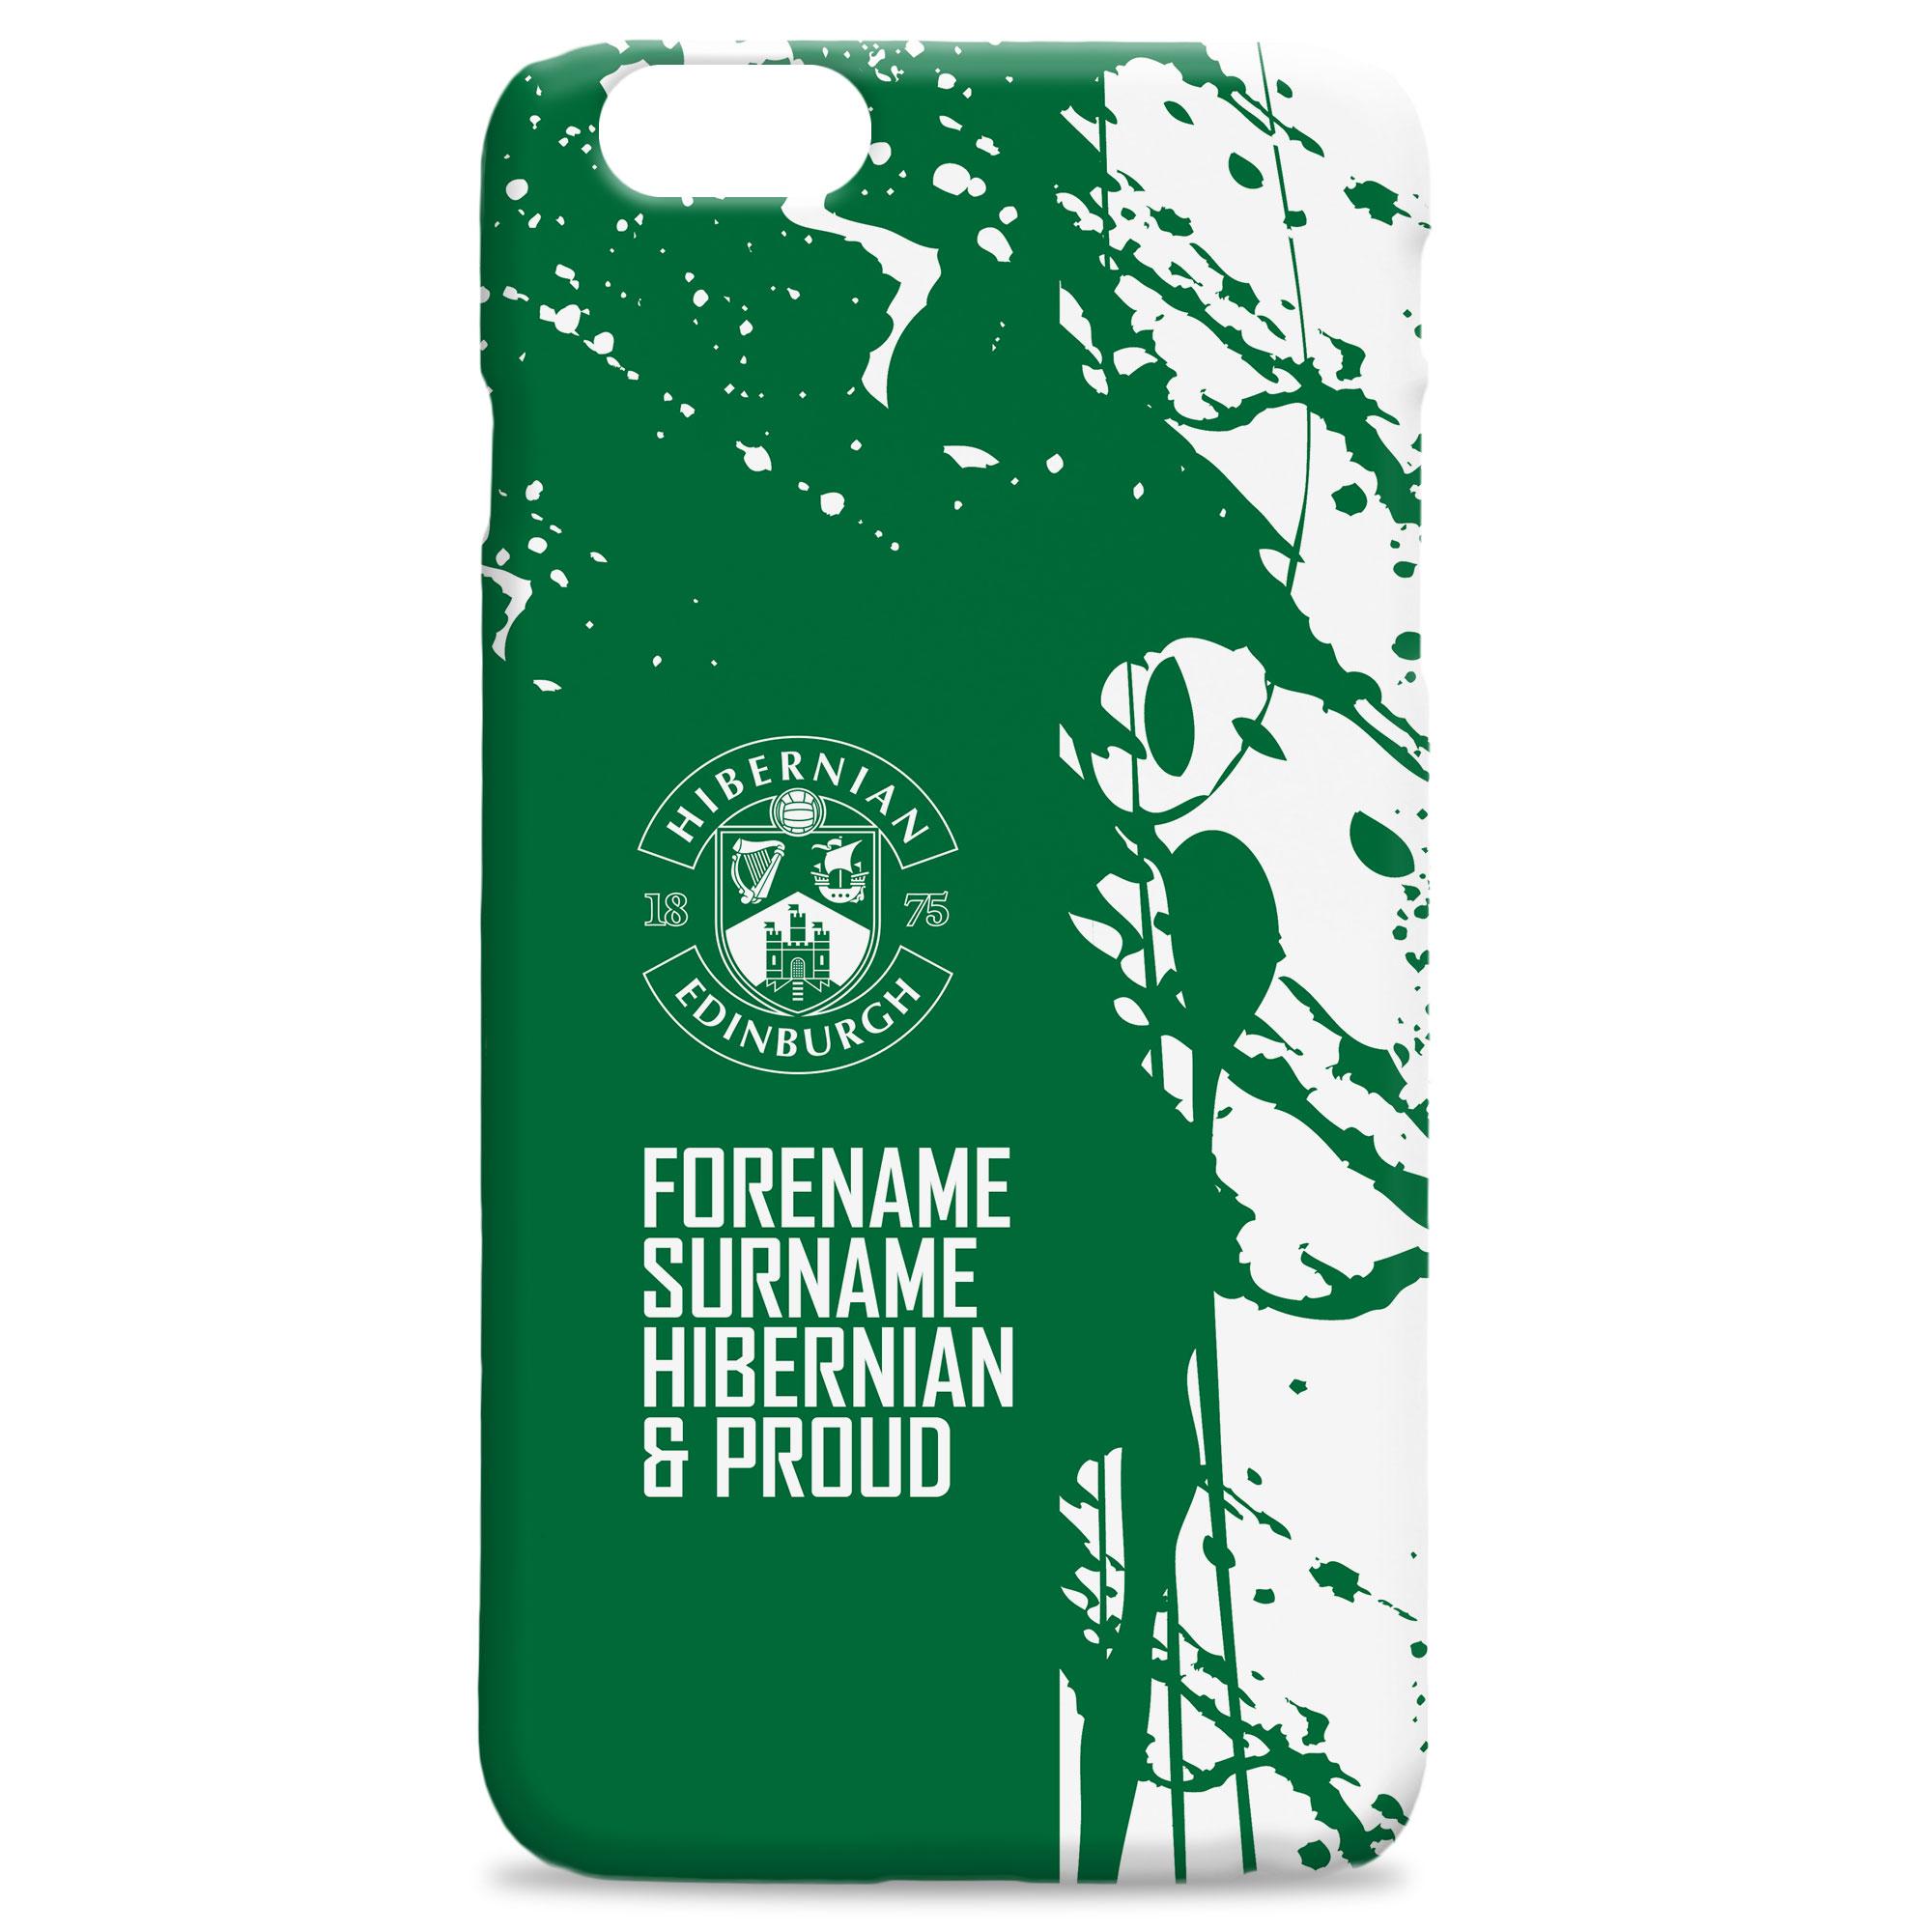 Hibernian FC Proud Hard Back Phone Case